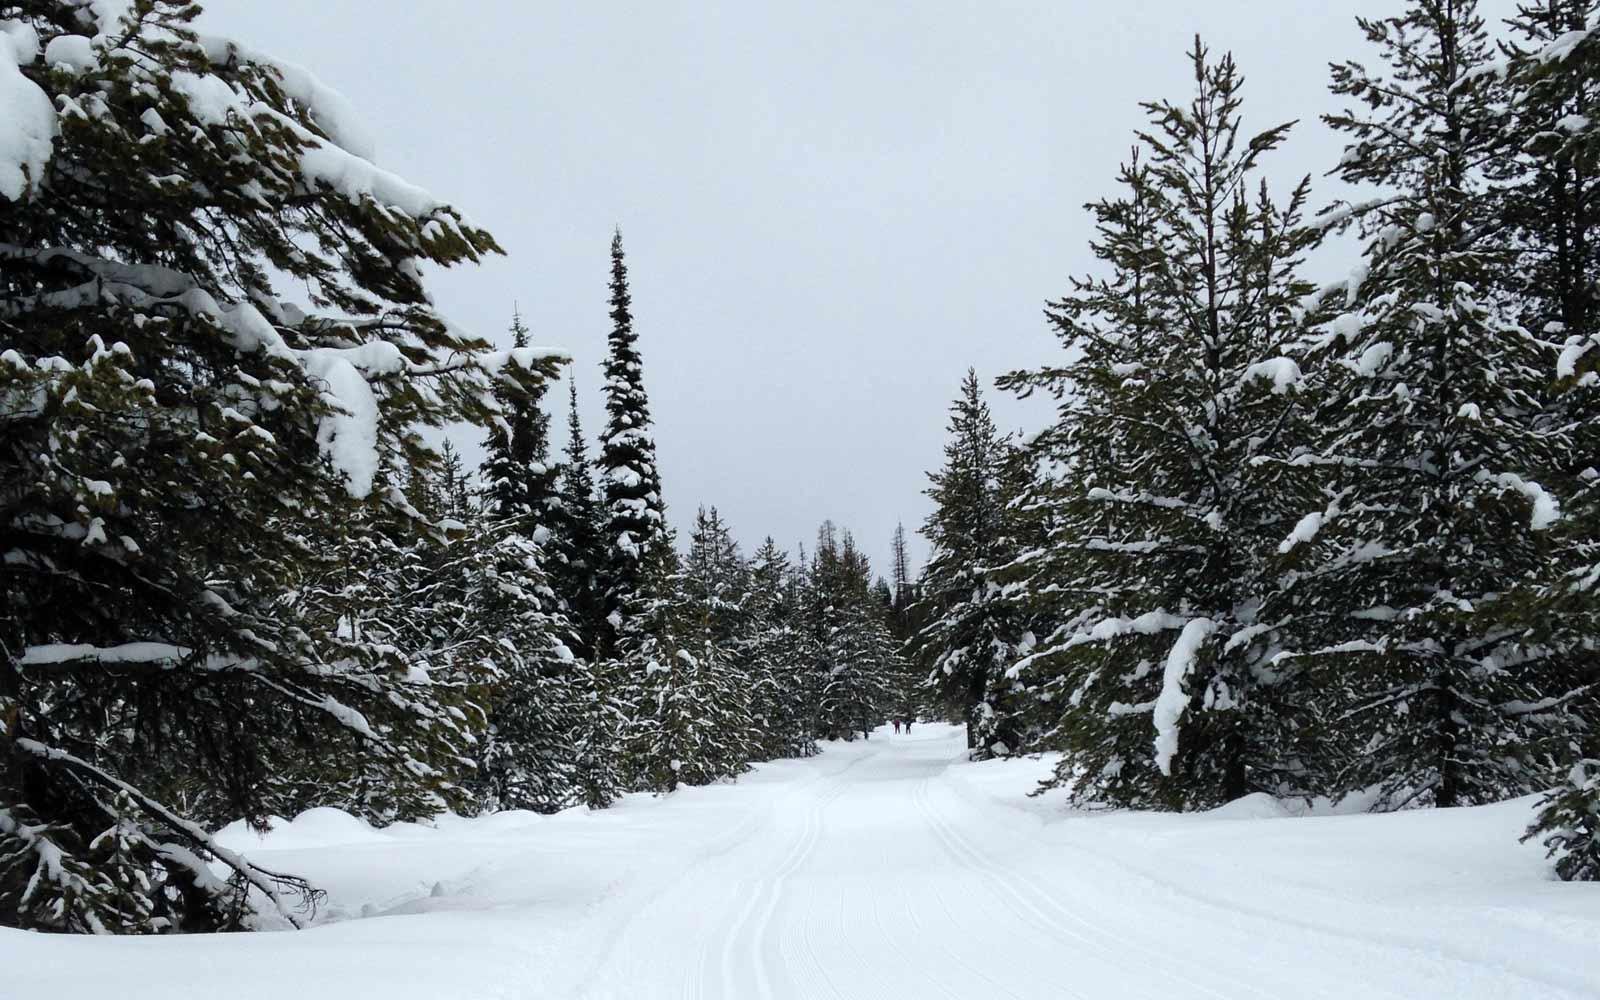 Schnee im Wald in Montana, USA